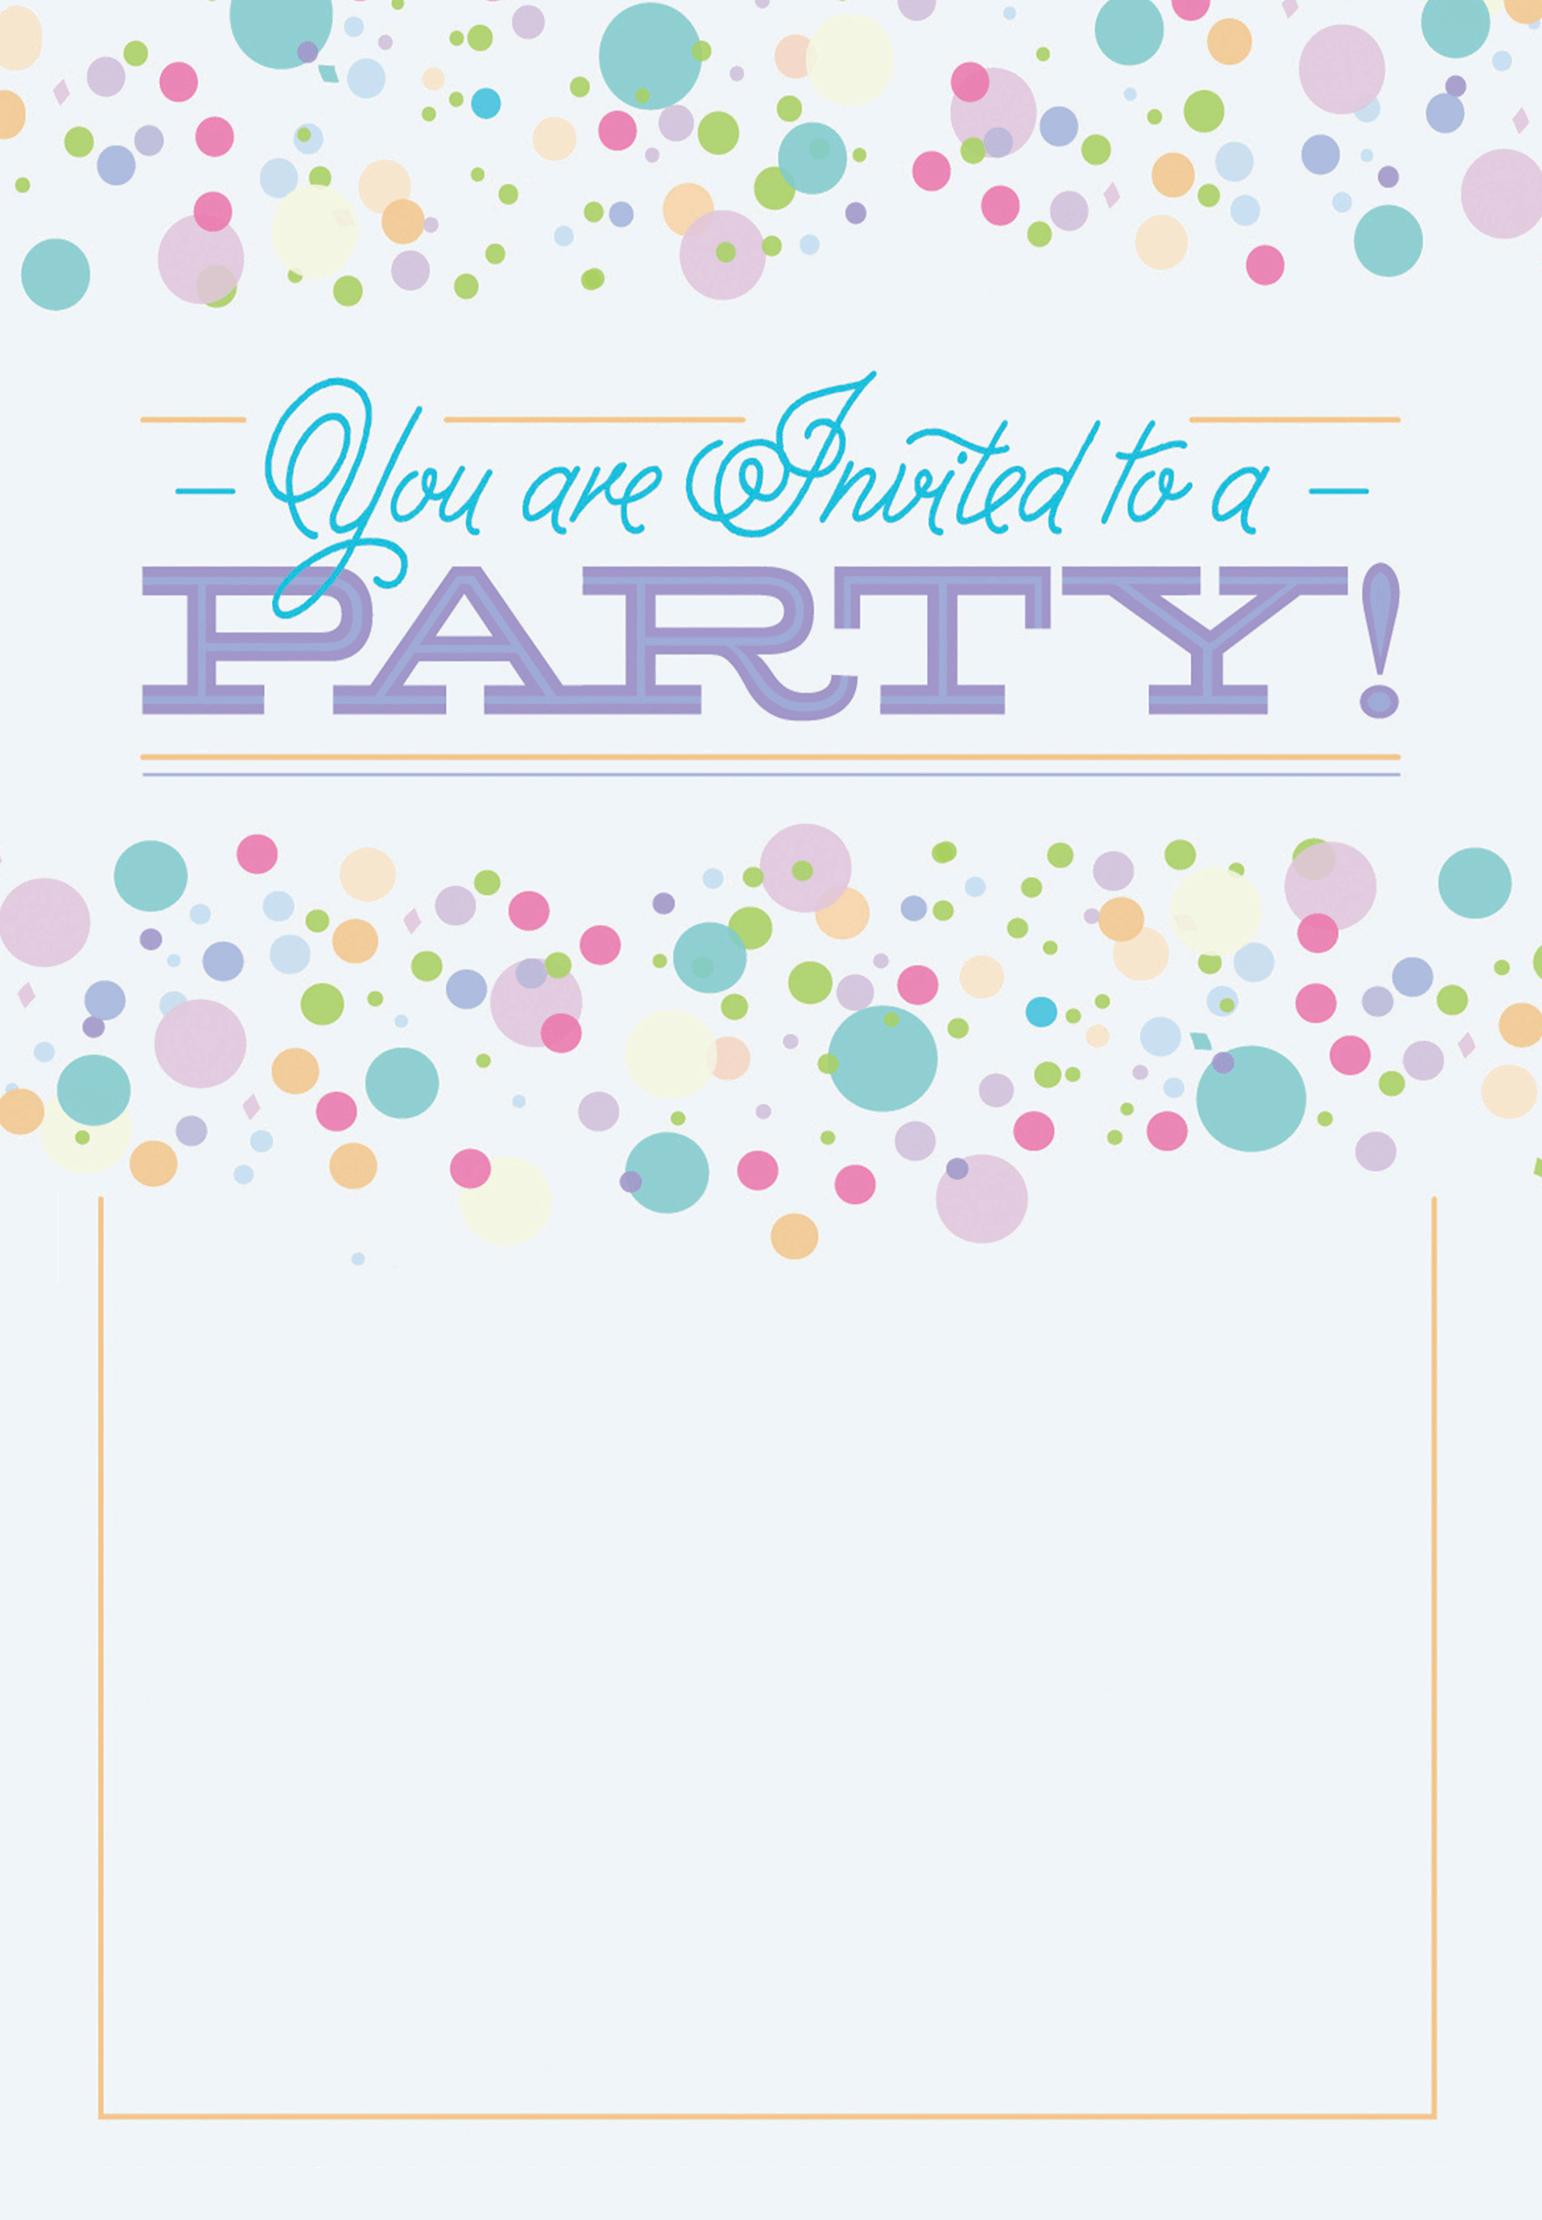 Polka Dots - Free Printable Party Invitation Template | Greetings - Free Printable Polka Dot Birthday Party Invitations